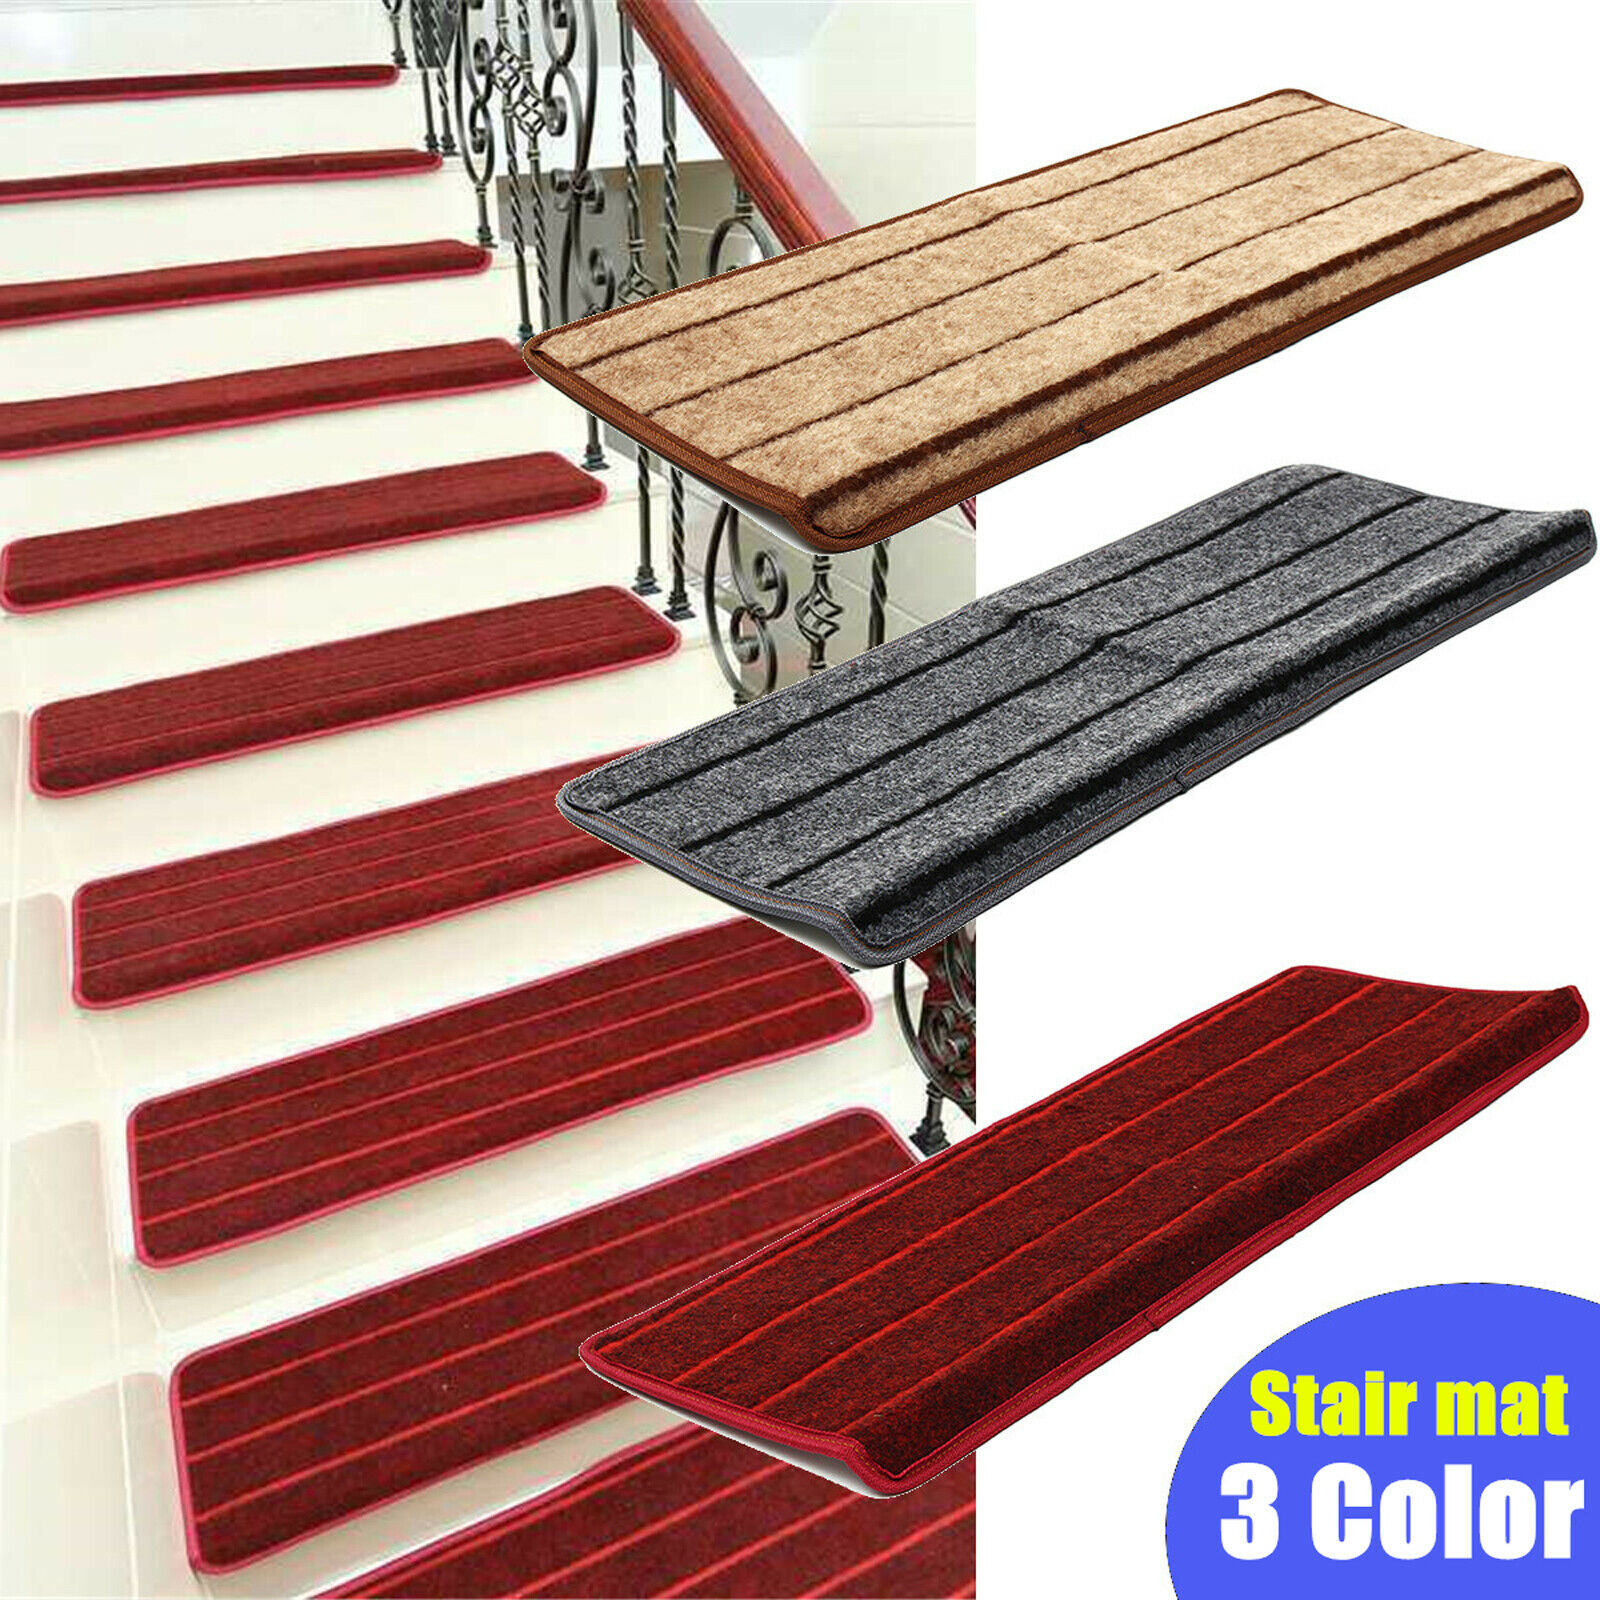 Image of: Non Slip Skid Self Adhesive Stair Tread Carpet Staircase Step Mat Rug Cover Pad No Glue 1pc Mat Aliexpress